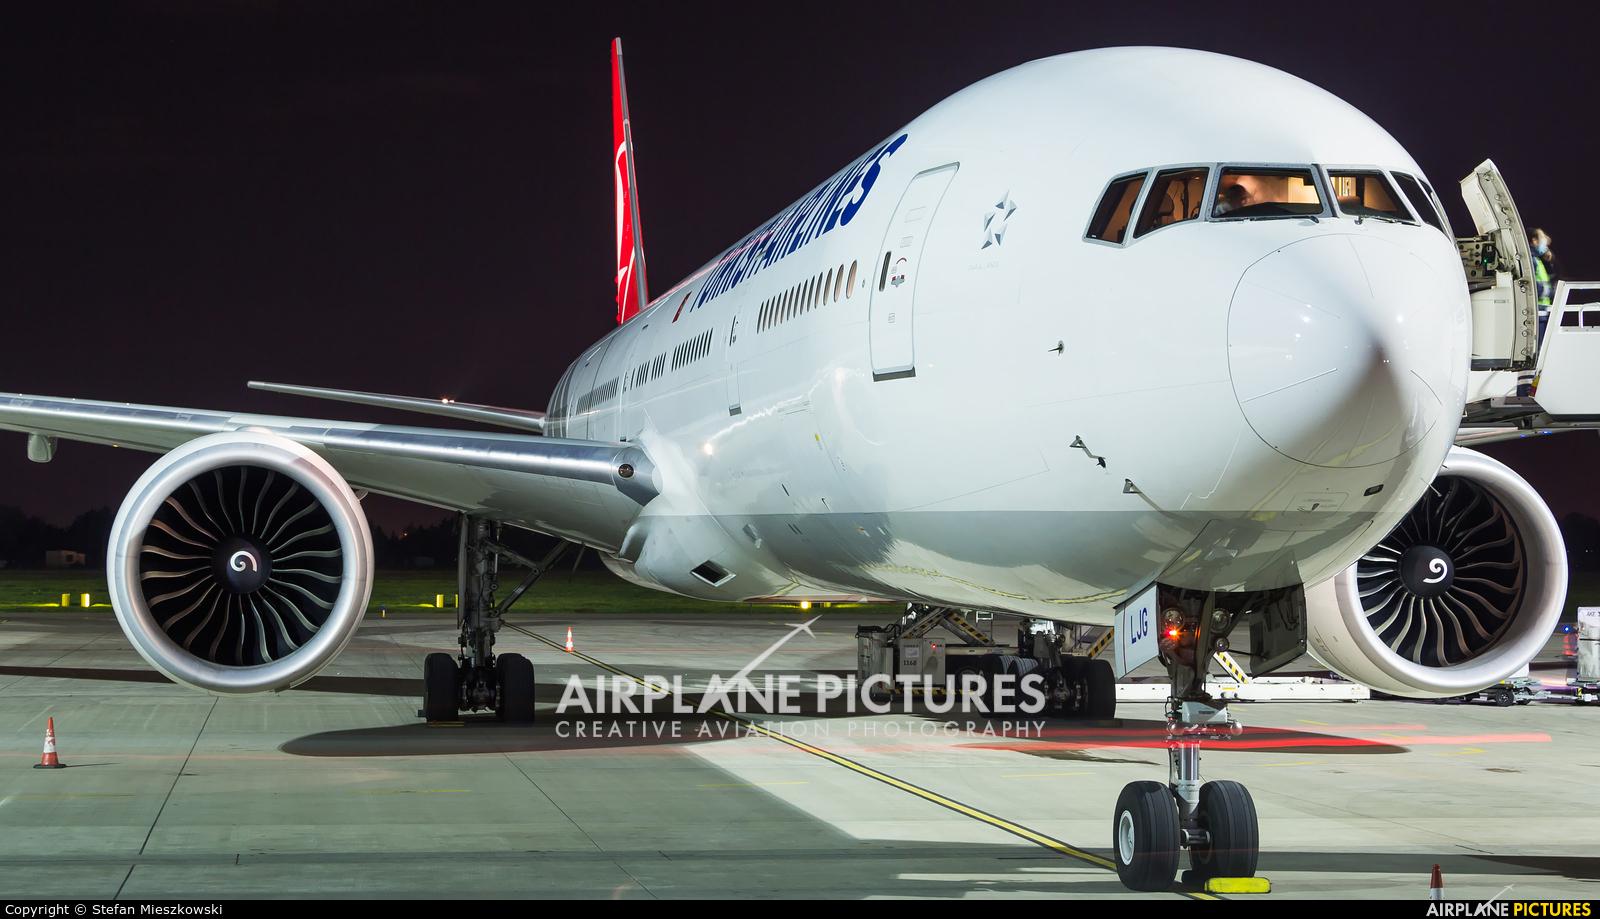 Turkish Airlines TC-LJG aircraft at Warsaw - Frederic Chopin